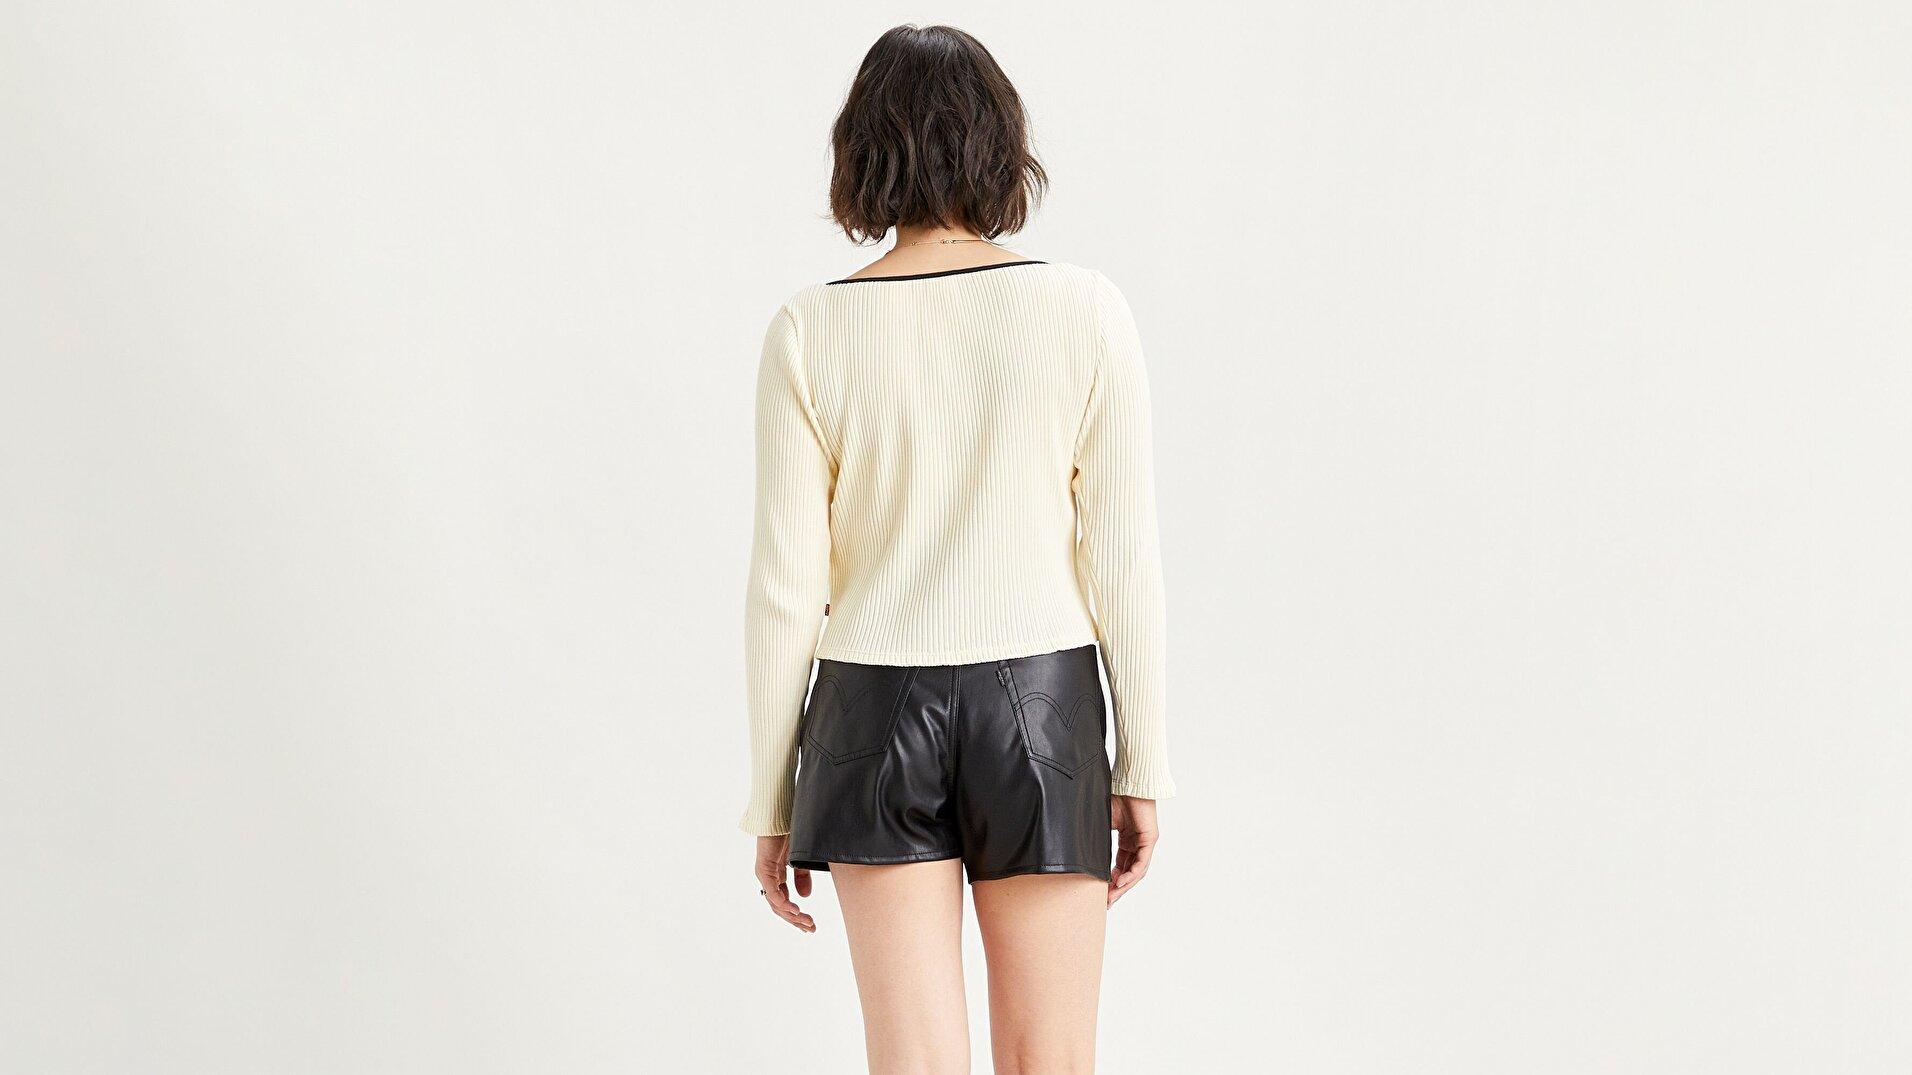 Brandy Ls Tee Tofu Beyaz Kadın Tişört